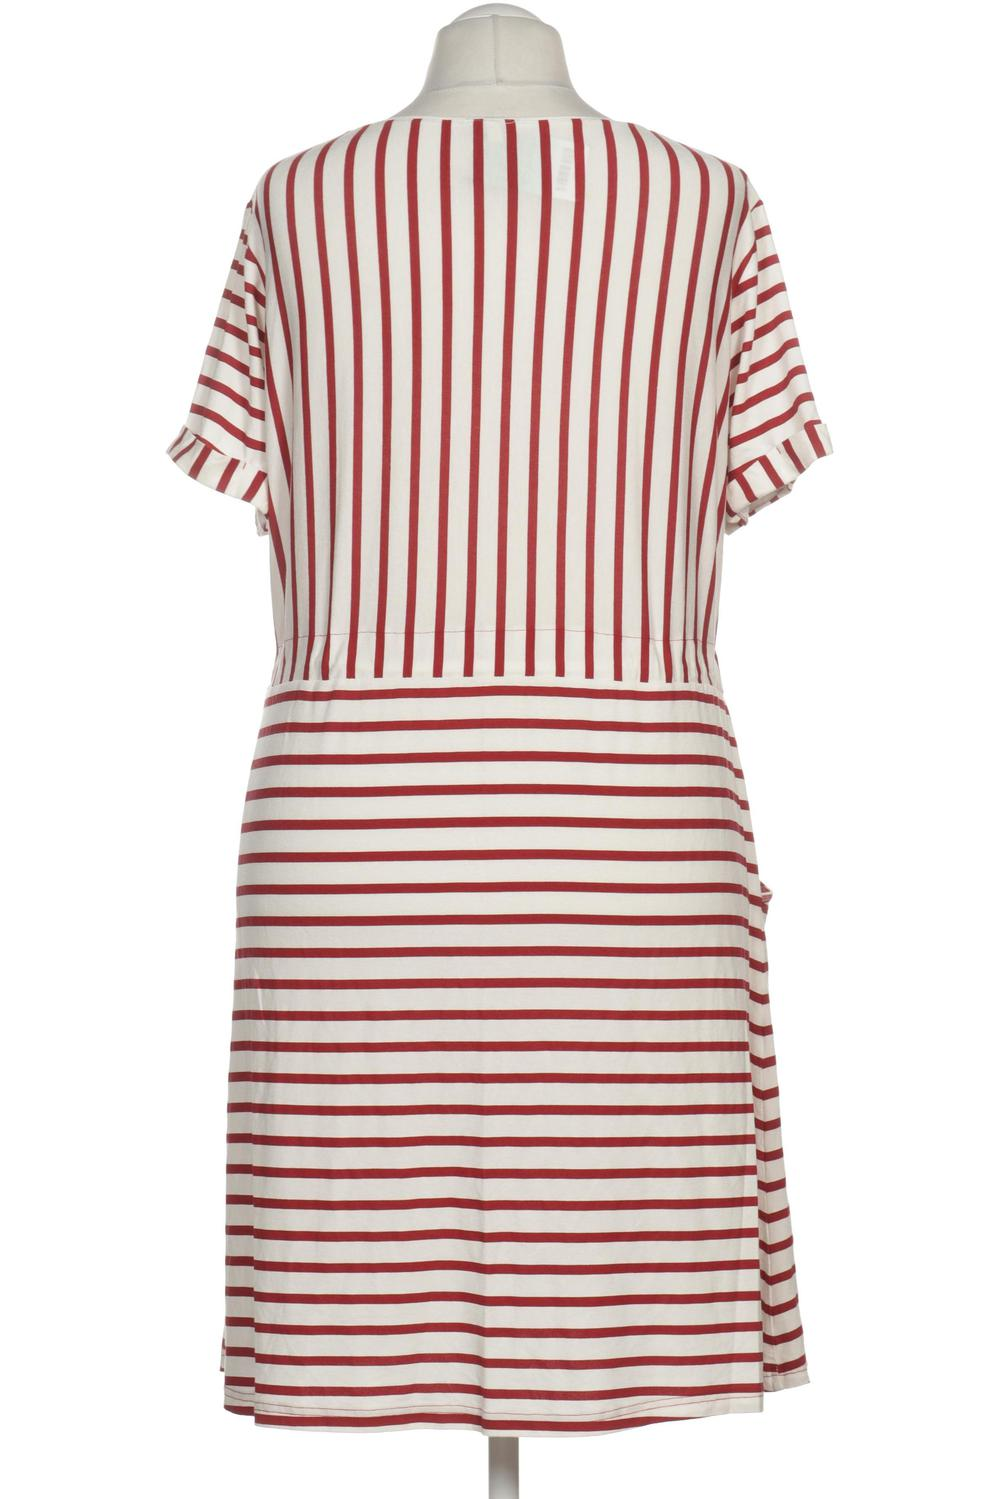 Deerberg Damen Kleid INT XL Second Hand kaufen | ubup